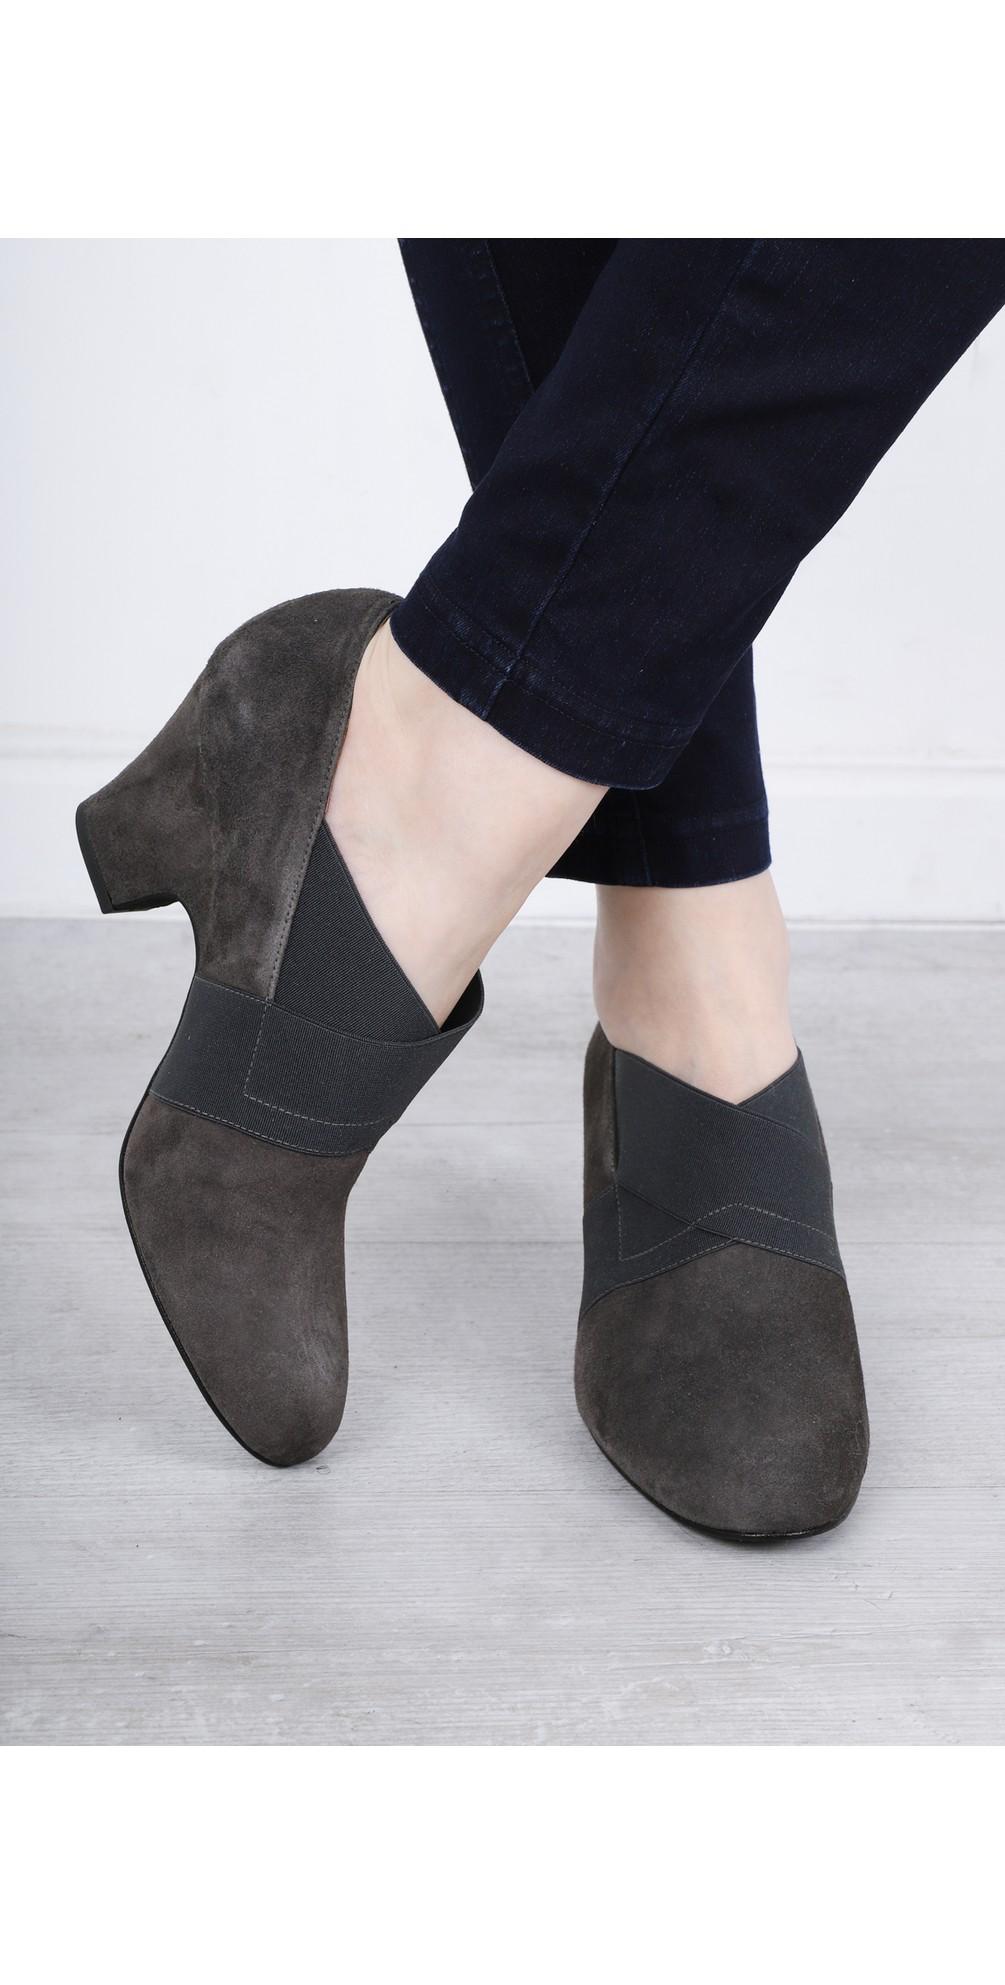 Bepra Anthracite Suede Crossover Elastic Shoe main image